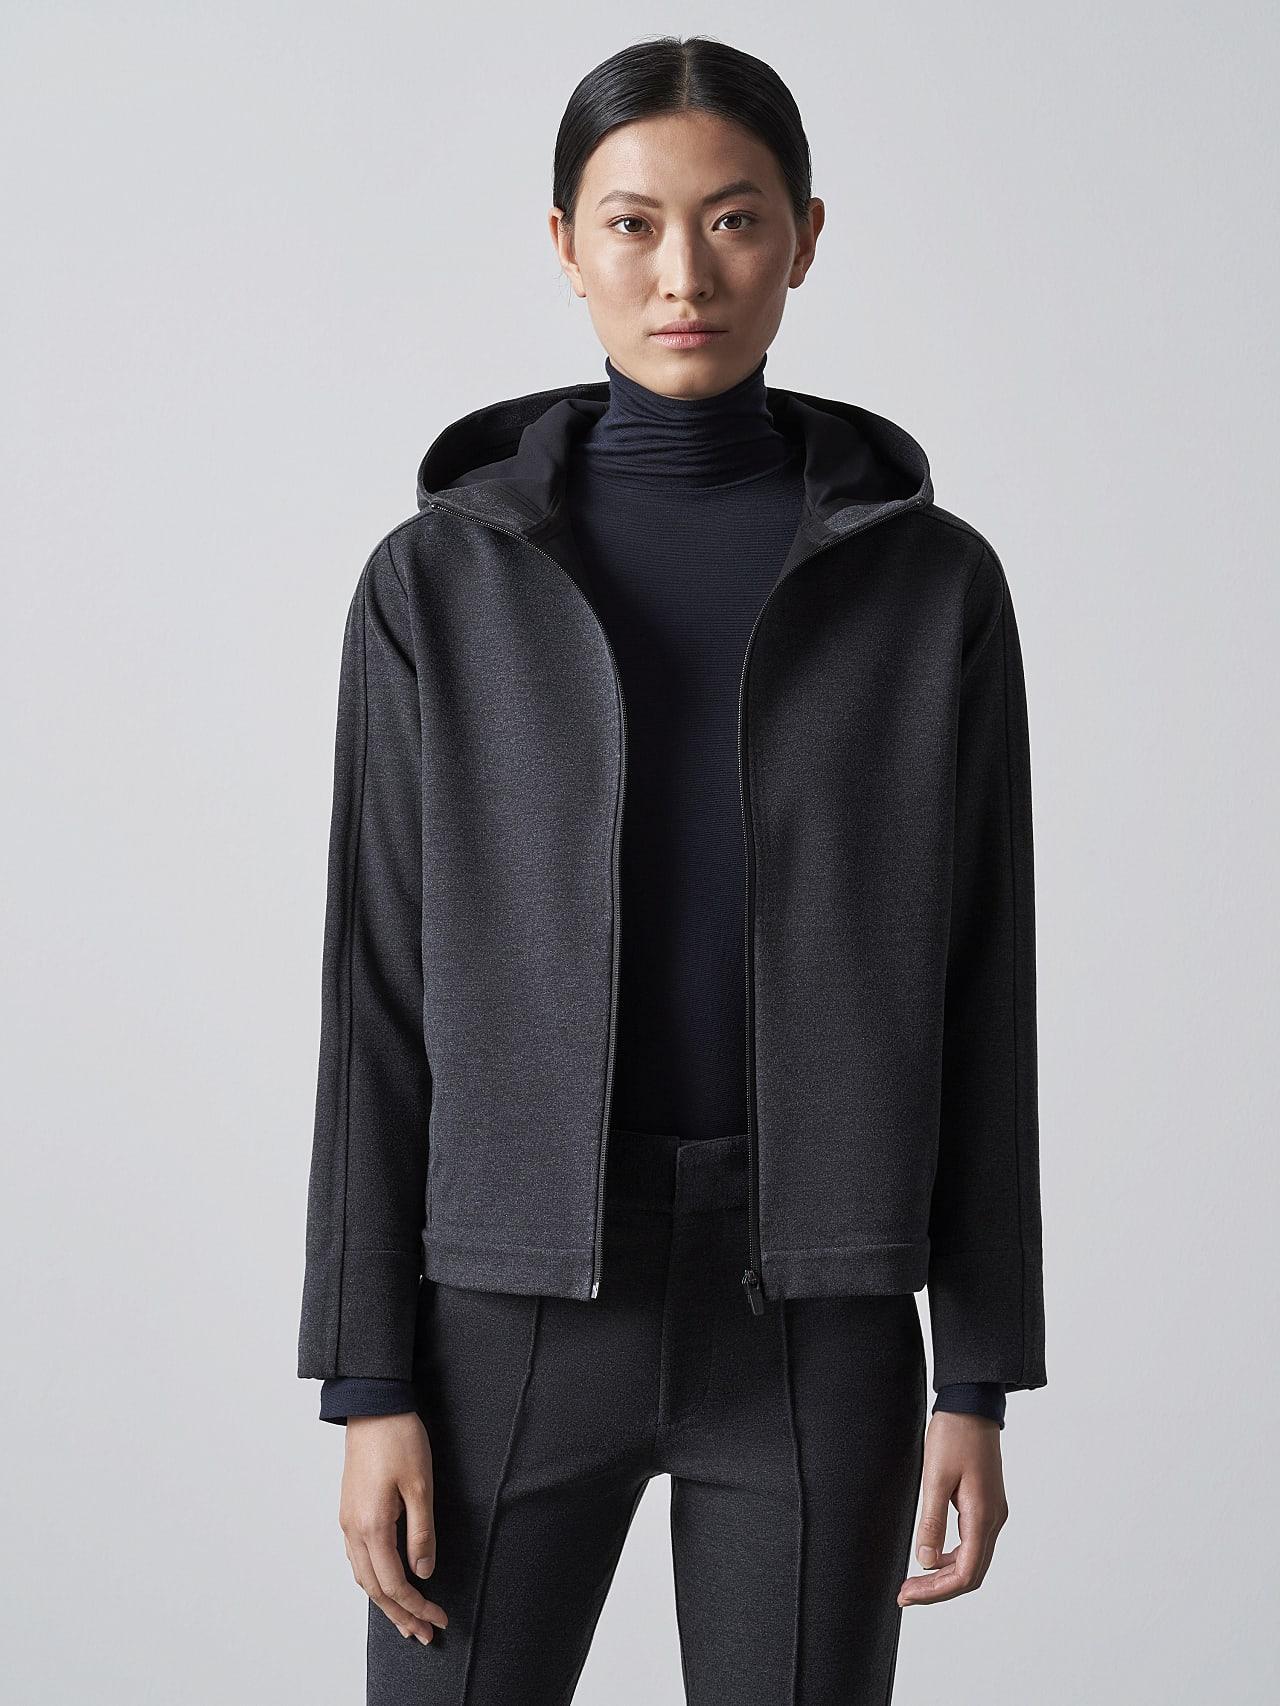 SINNO V2.Y5.02 Waterproof Hooded Jacket dark grey / anthracite Model shot Alpha Tauri